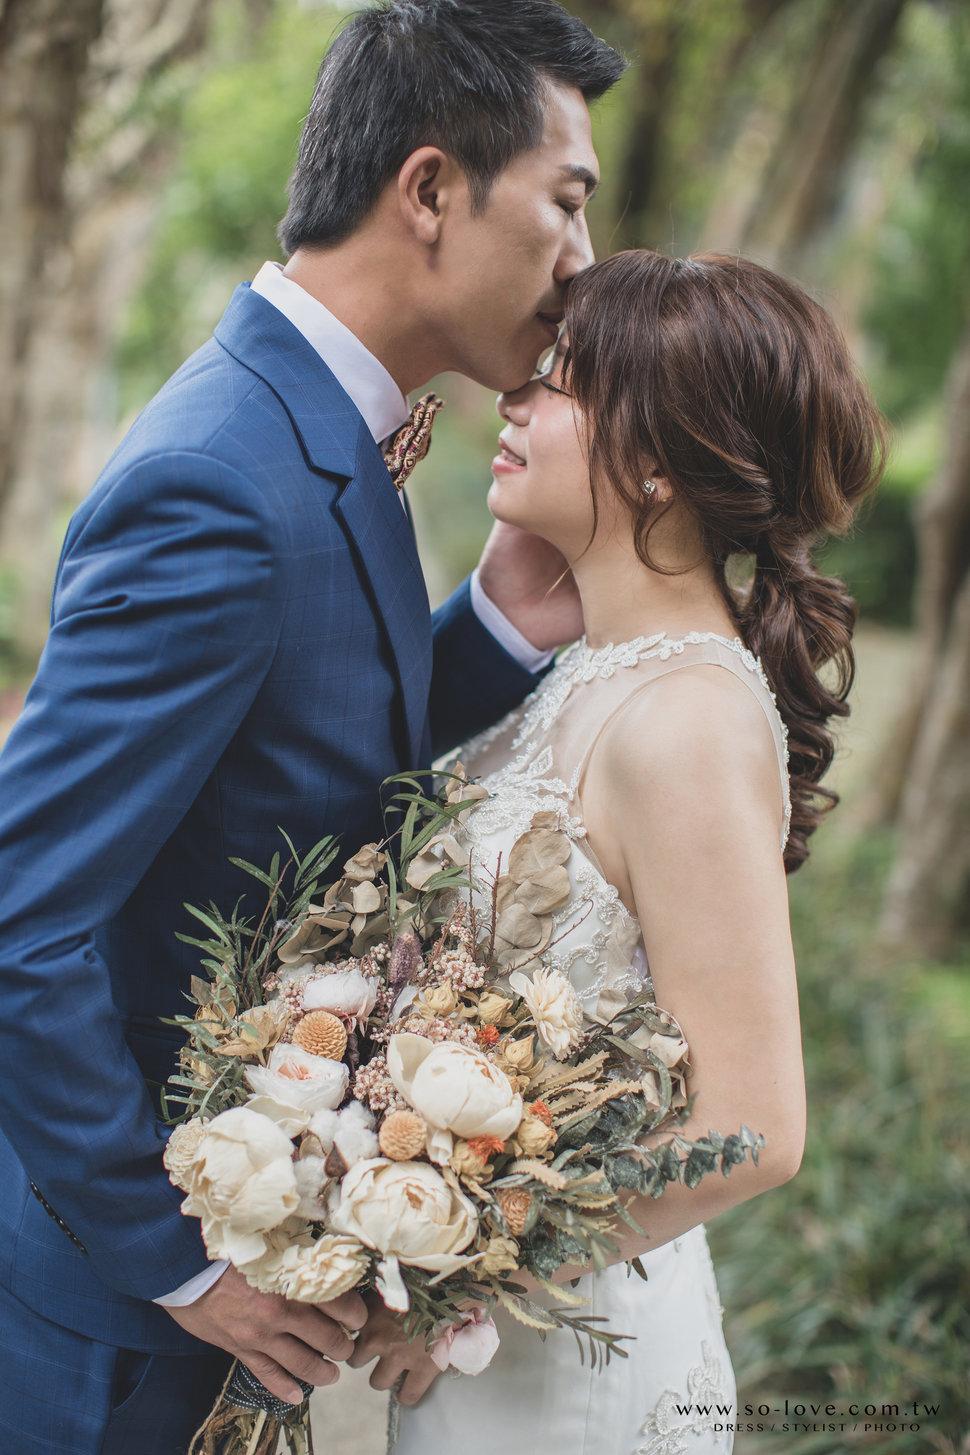 RYAN8101 - So.Love Wedding 樂樂蕾絲《結婚吧》